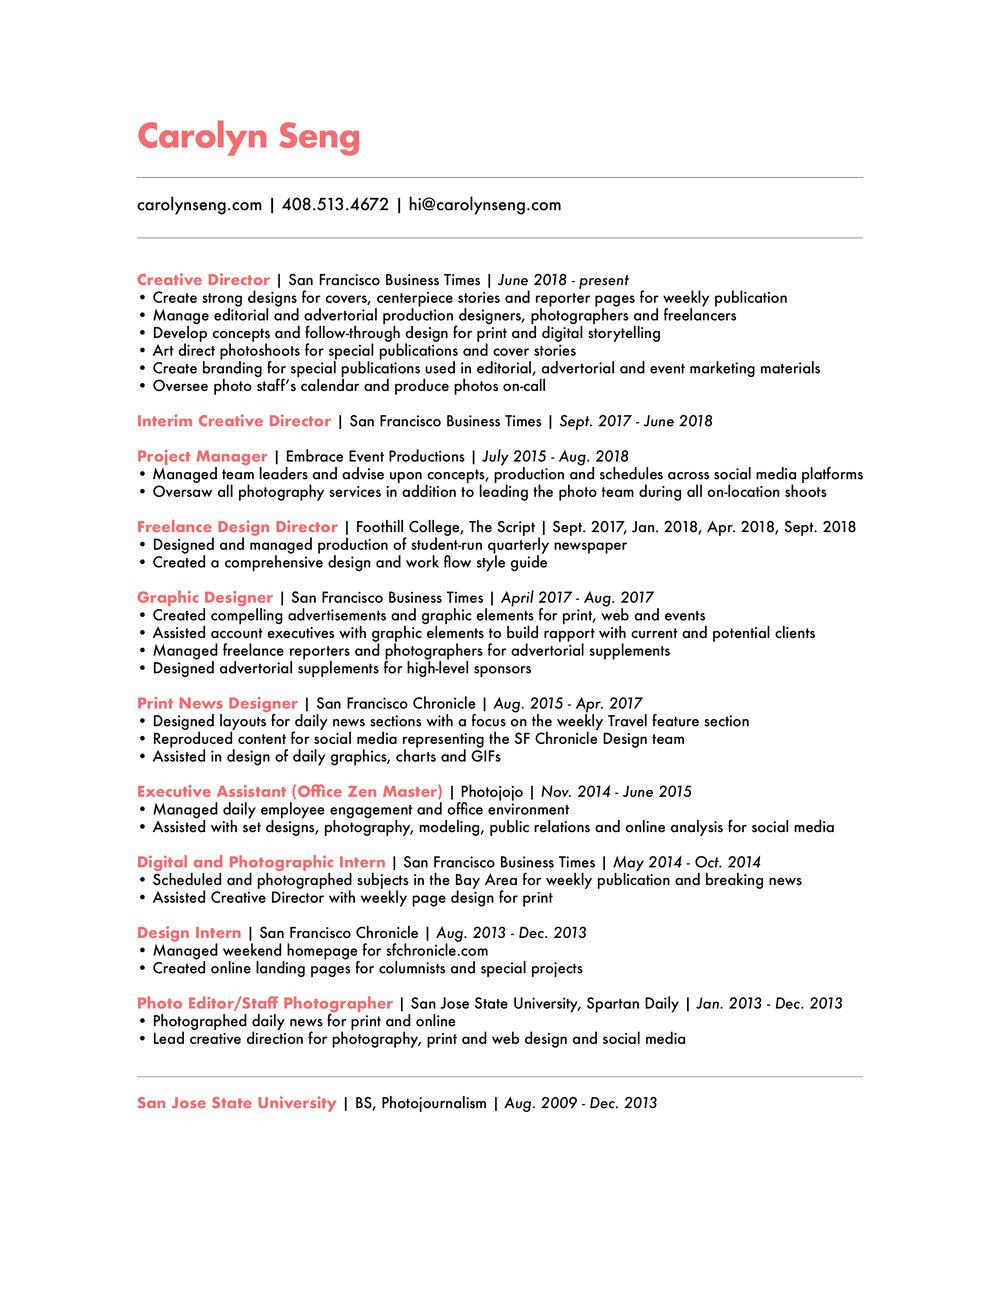 CarolynSeng_resume.jpg